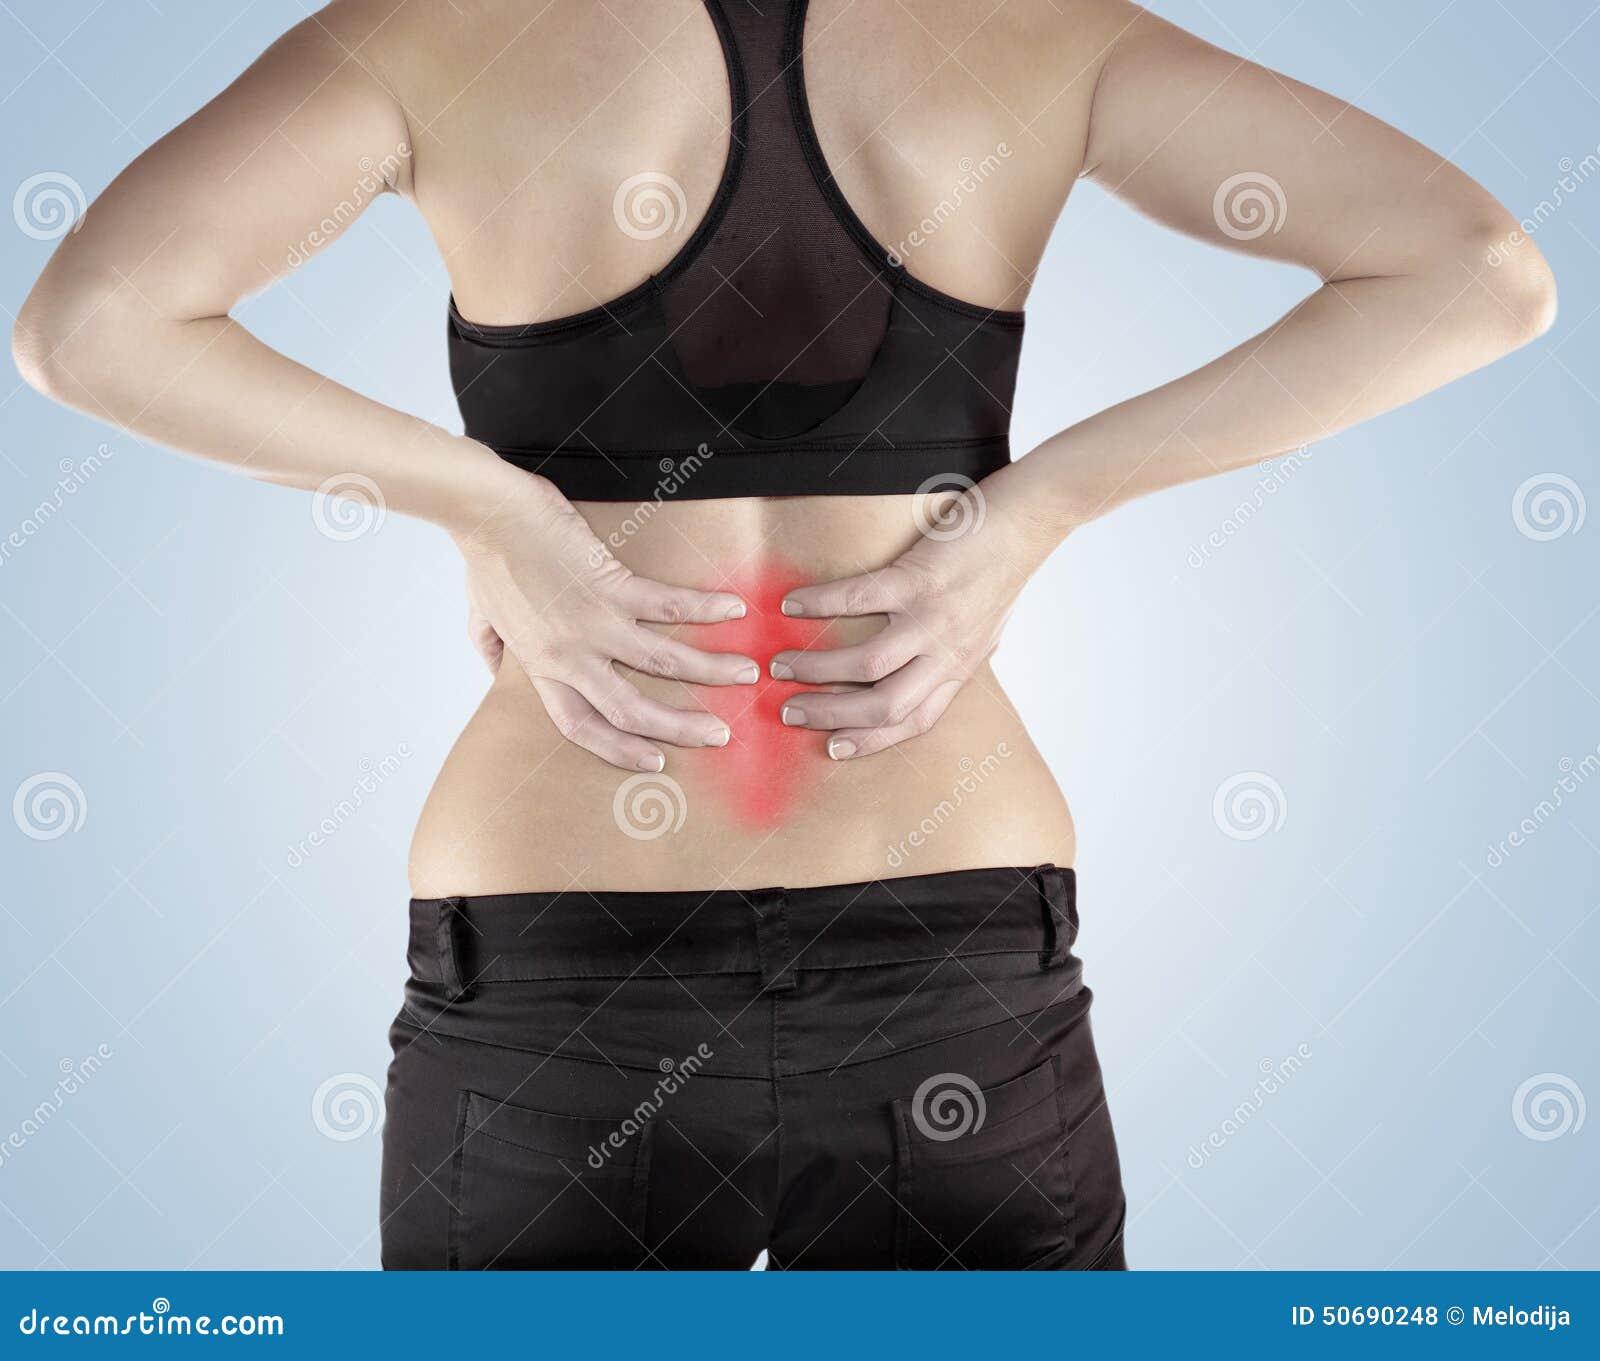 Download 有棕榈的妇女回到展示痛苦和伤害后面 库存照片. 图片 包括有 执行, 协助, 健康, 复制, 伤害, 女性 - 50690248